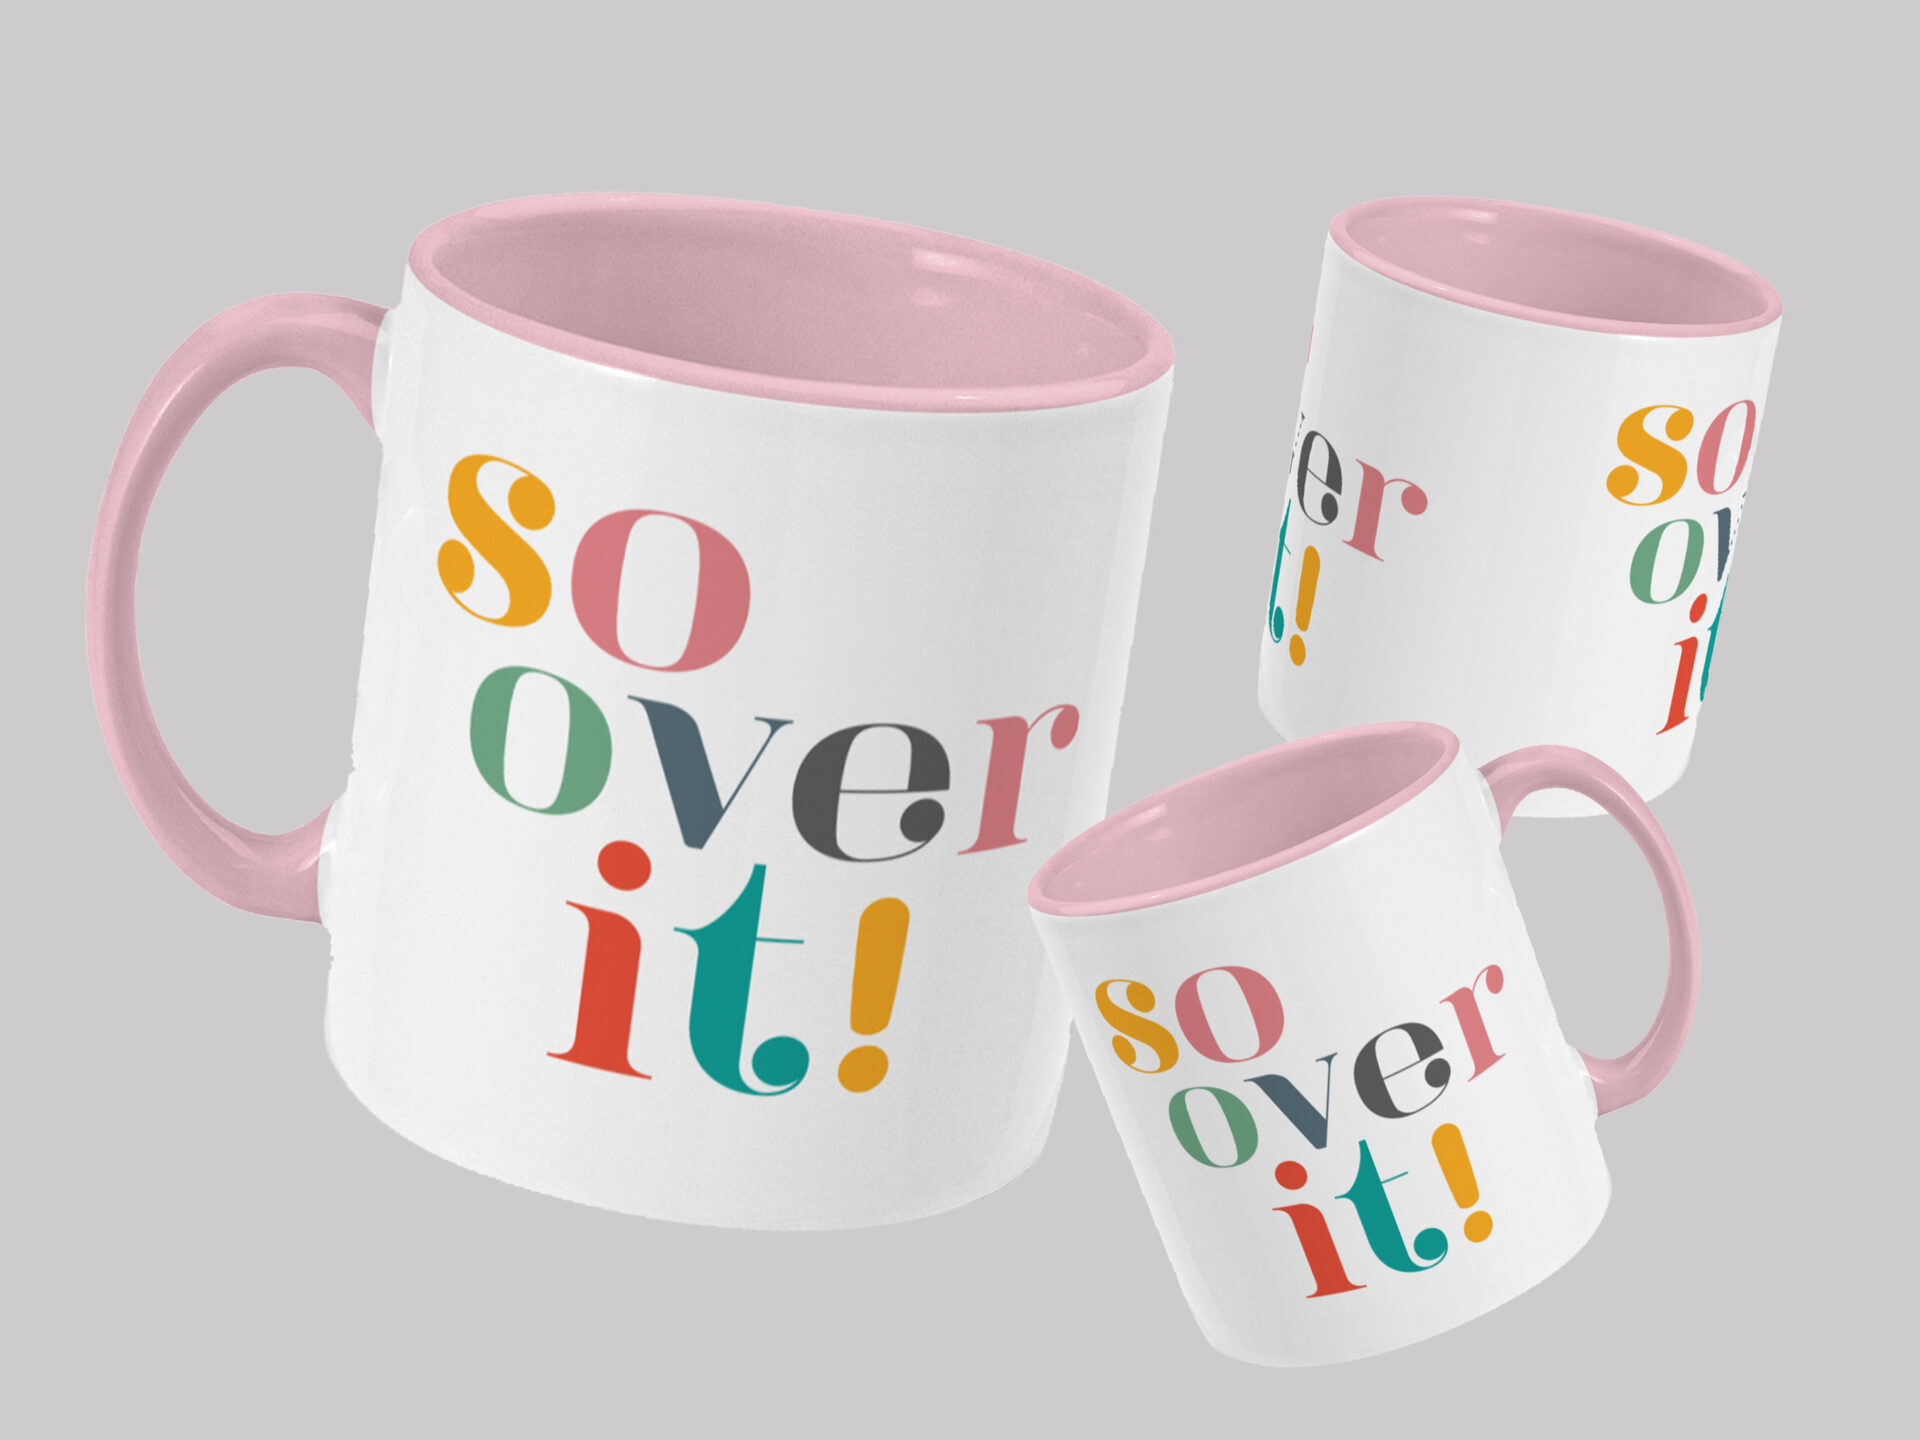 So Over It! Mug